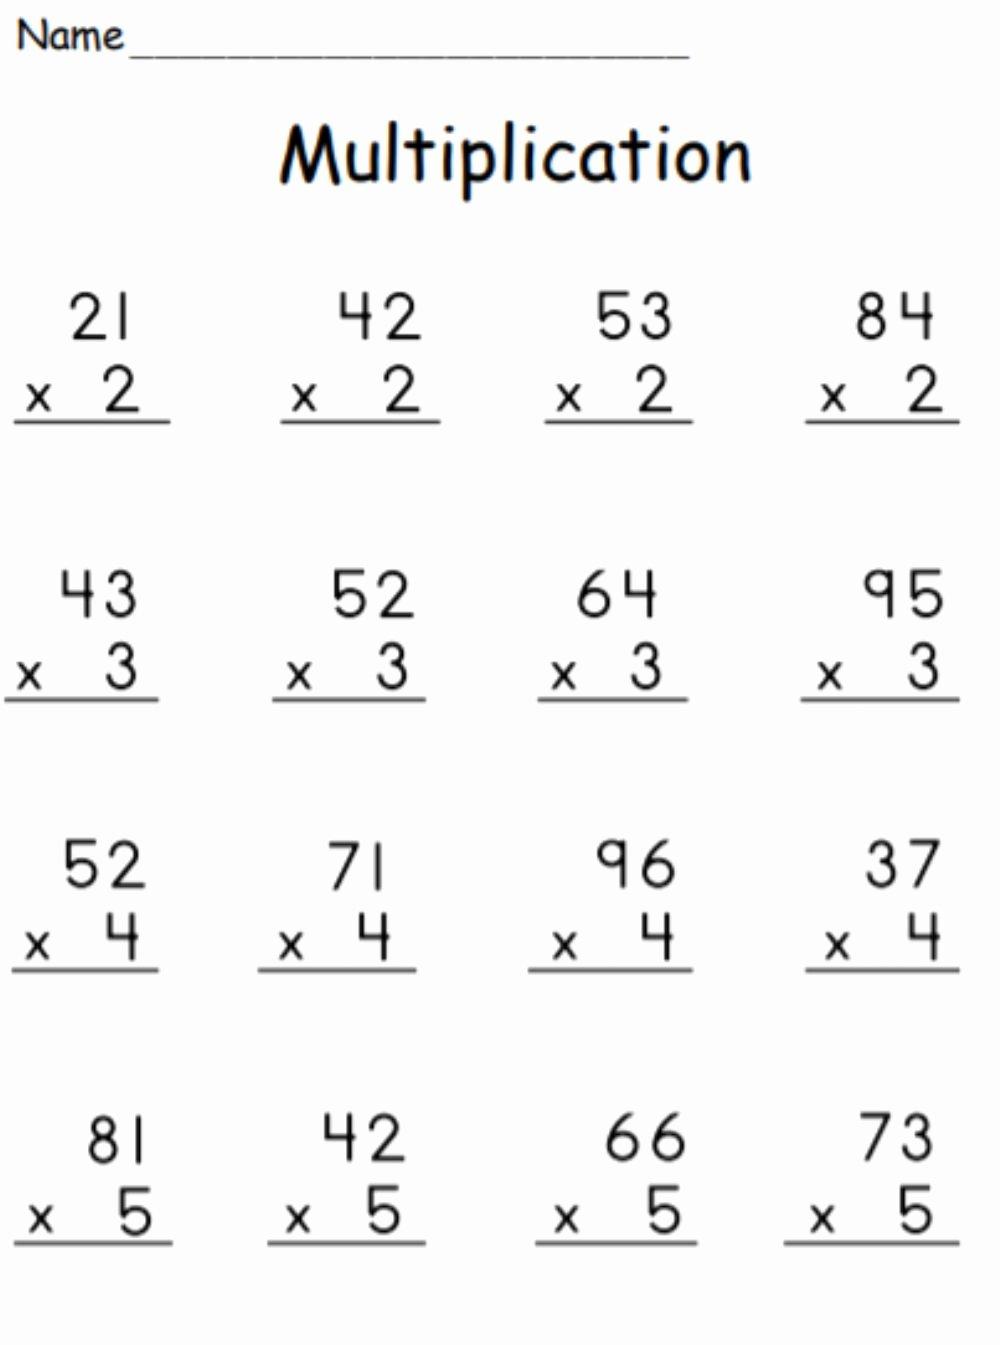 21 Digit Multiplication Worksheets Top Multiplication 2